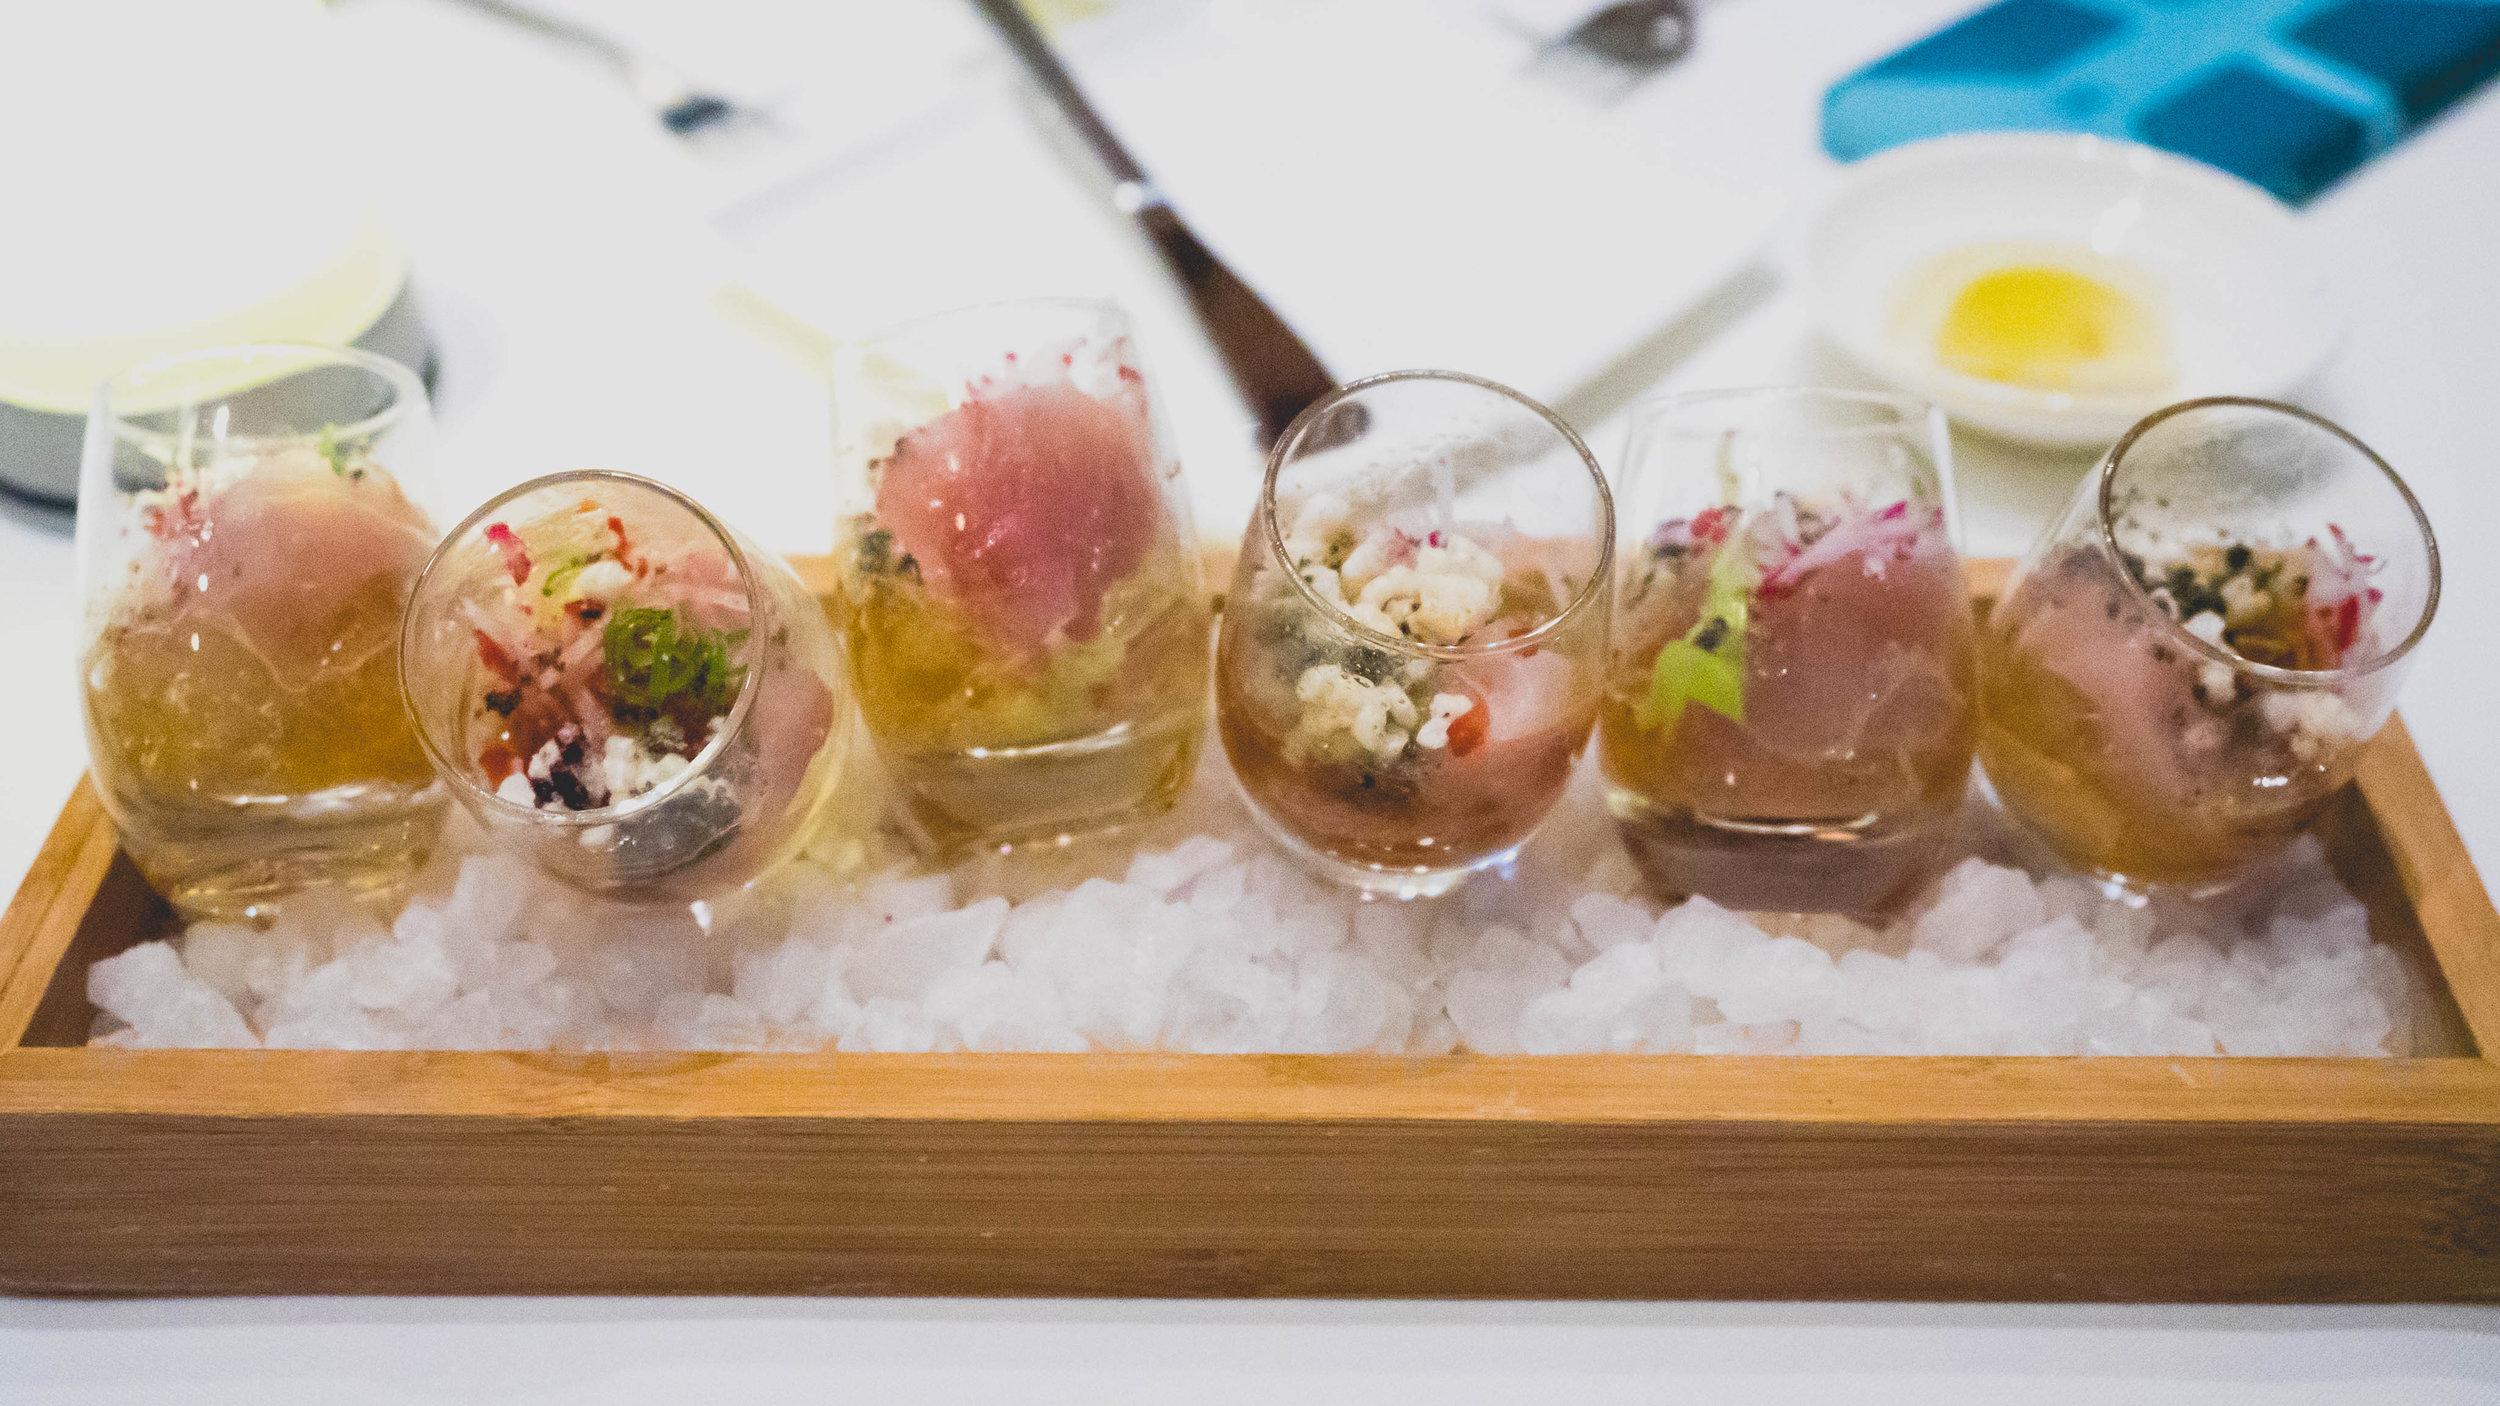 hamachi shots 3.0 : dashi, avocado, fresno, ponzu, negi, arare.